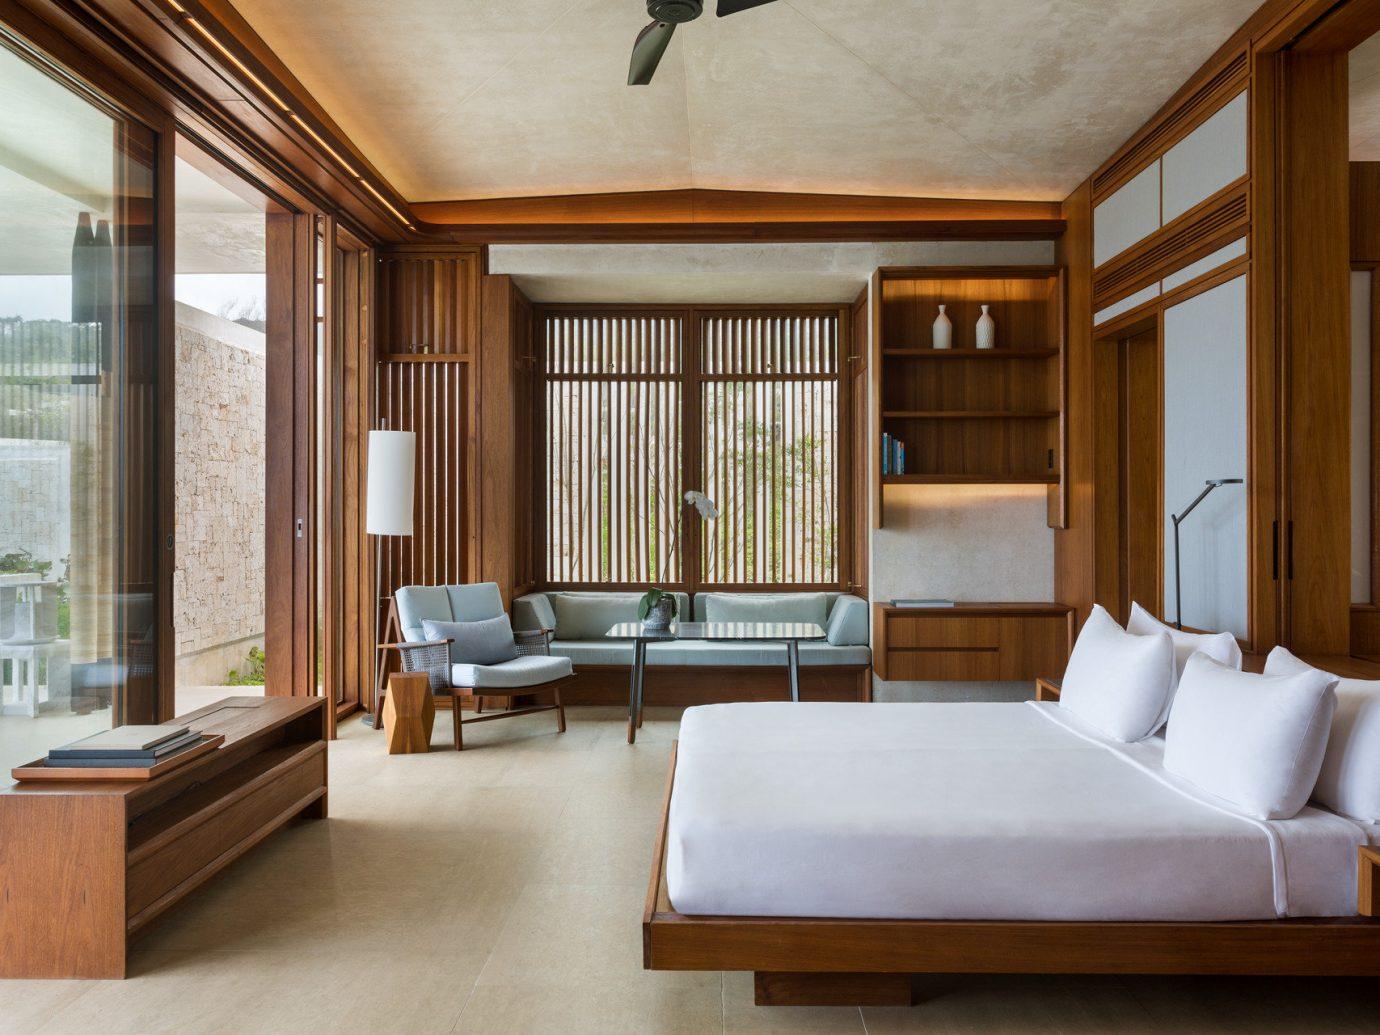 Bedroom At Amanera Luxury Resort In Playa Grande, Dominican Republic